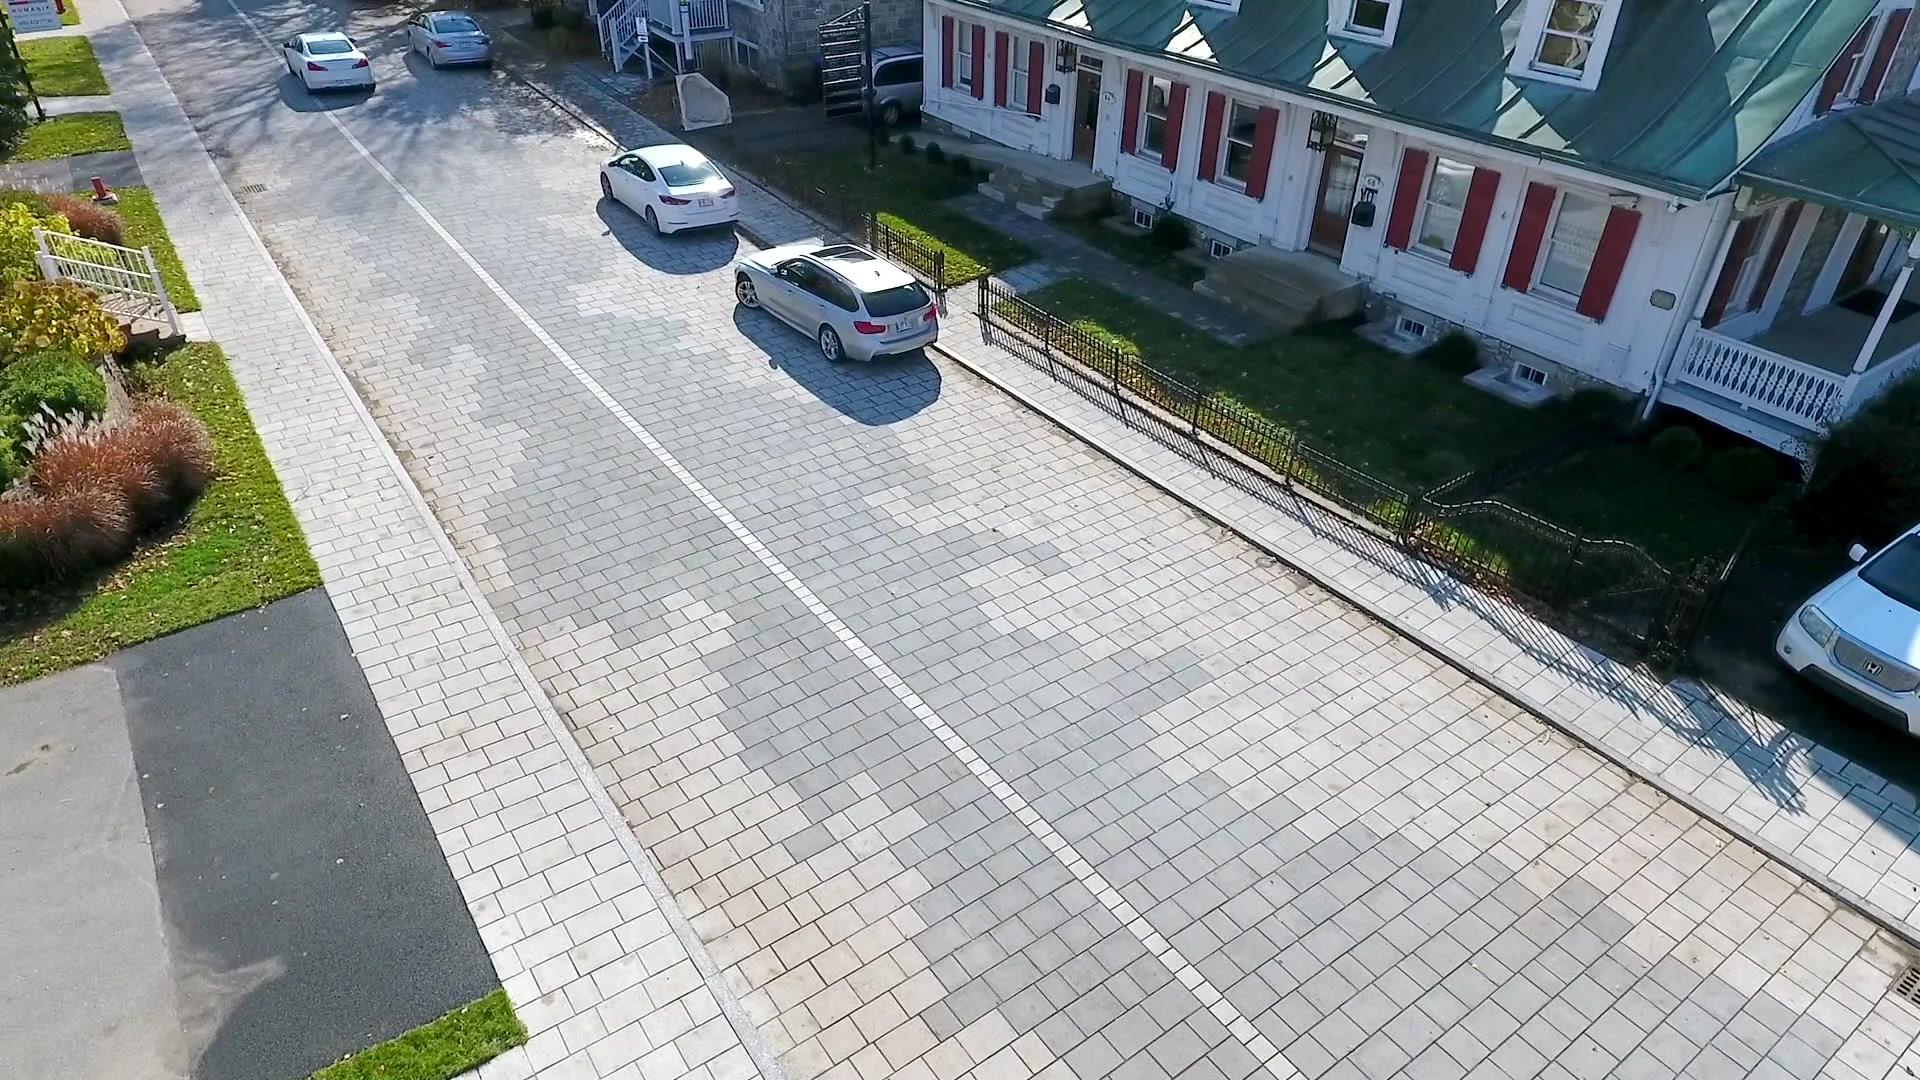 Pavé & paysagiste Boisbriand - Résidentiel - Commercial - Aménagement - Trottoir - Boisbriand